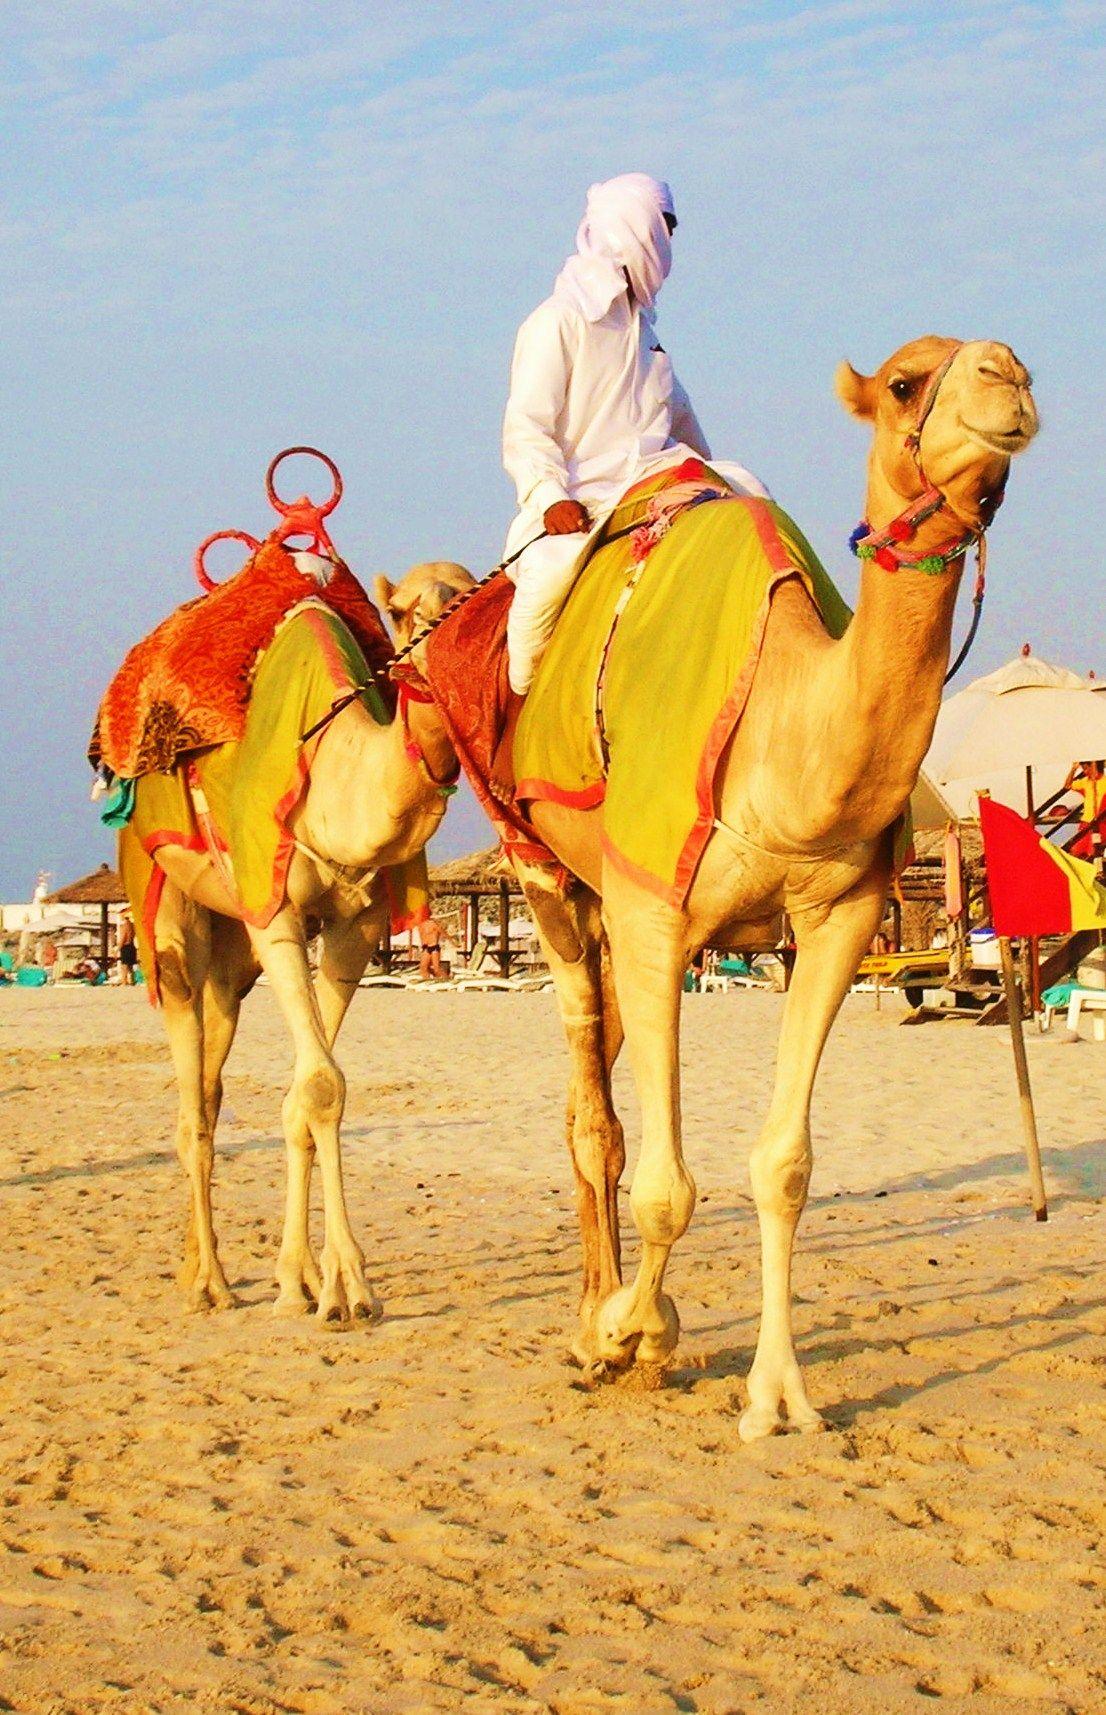 #Dubai #camels #beach 2006